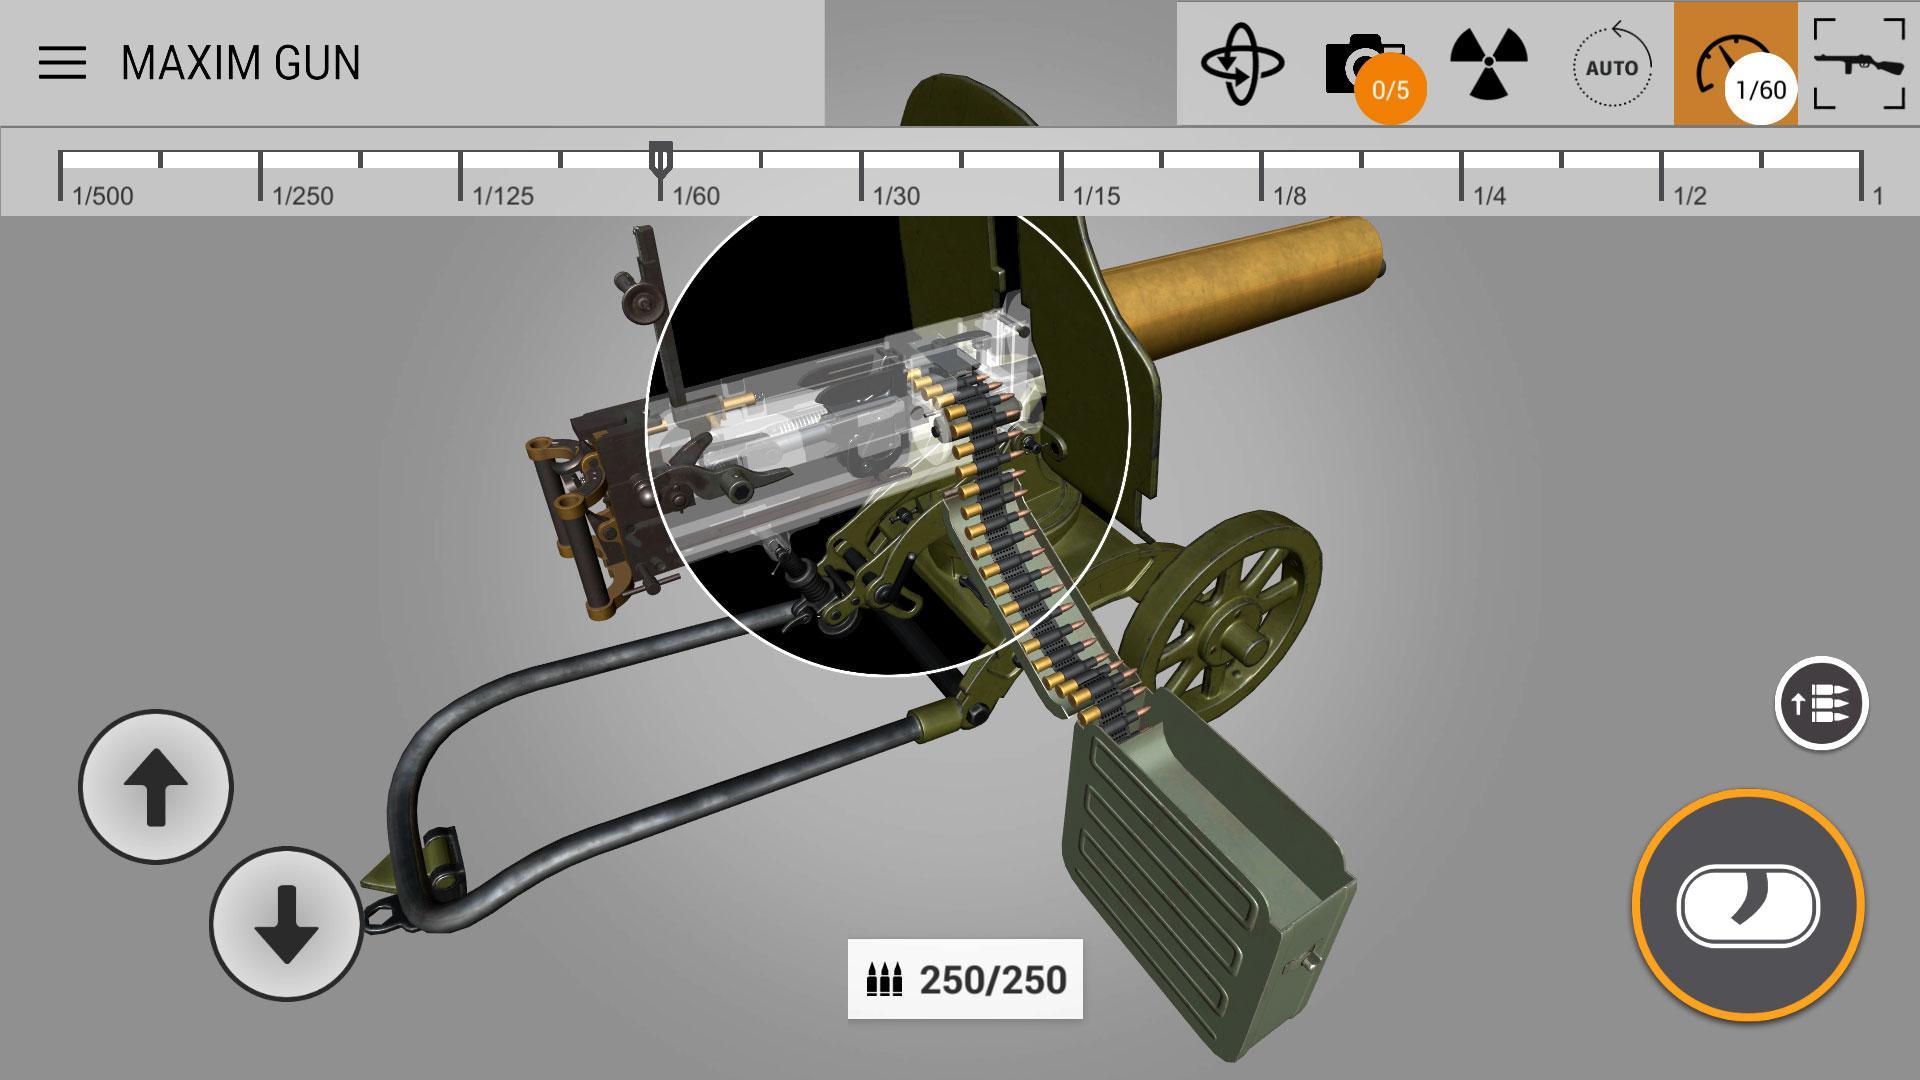 Оружие героев. Пулемет Максима под рентгеном и разборка ППШ-41 до винтика - 1